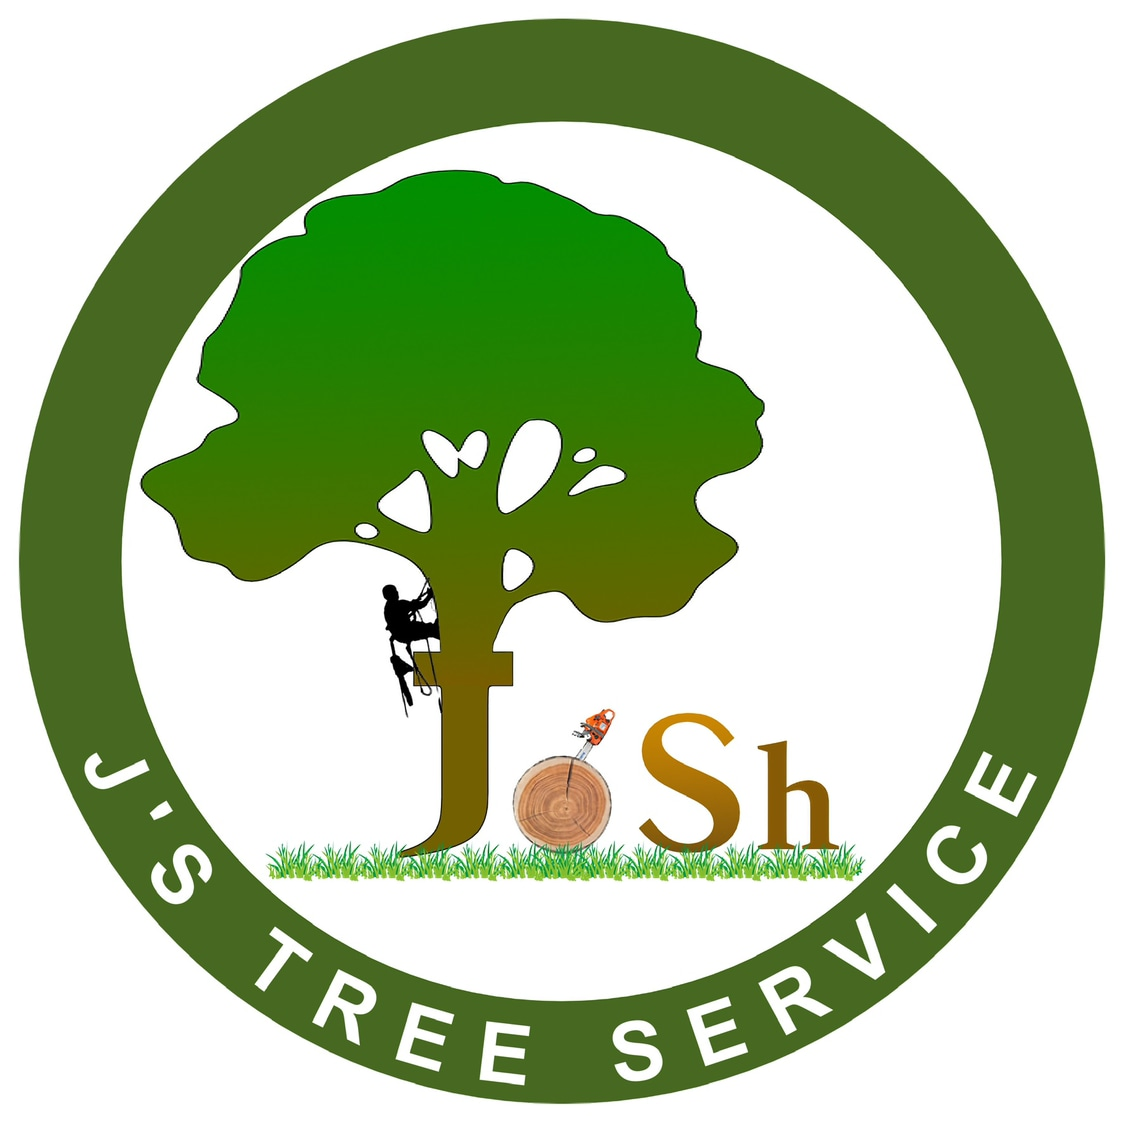 Js tree service